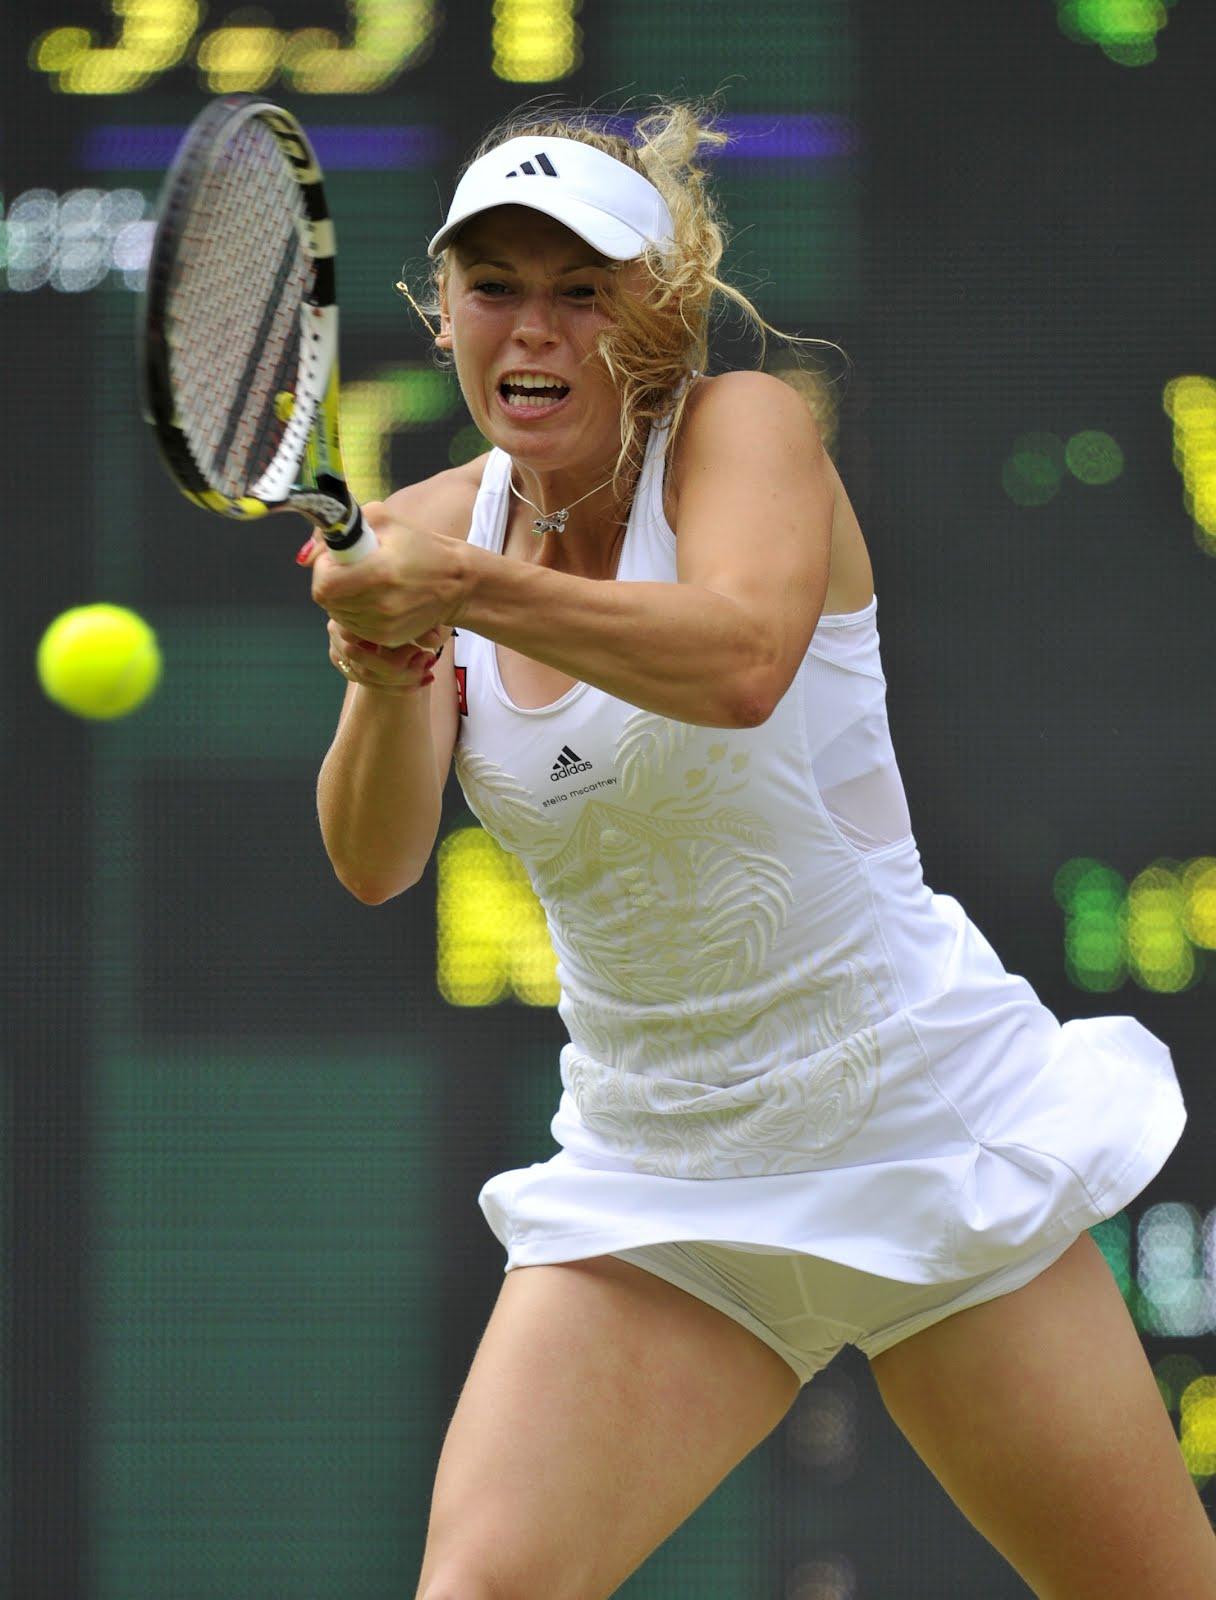 Can Sexy tennis pic upskirts touching